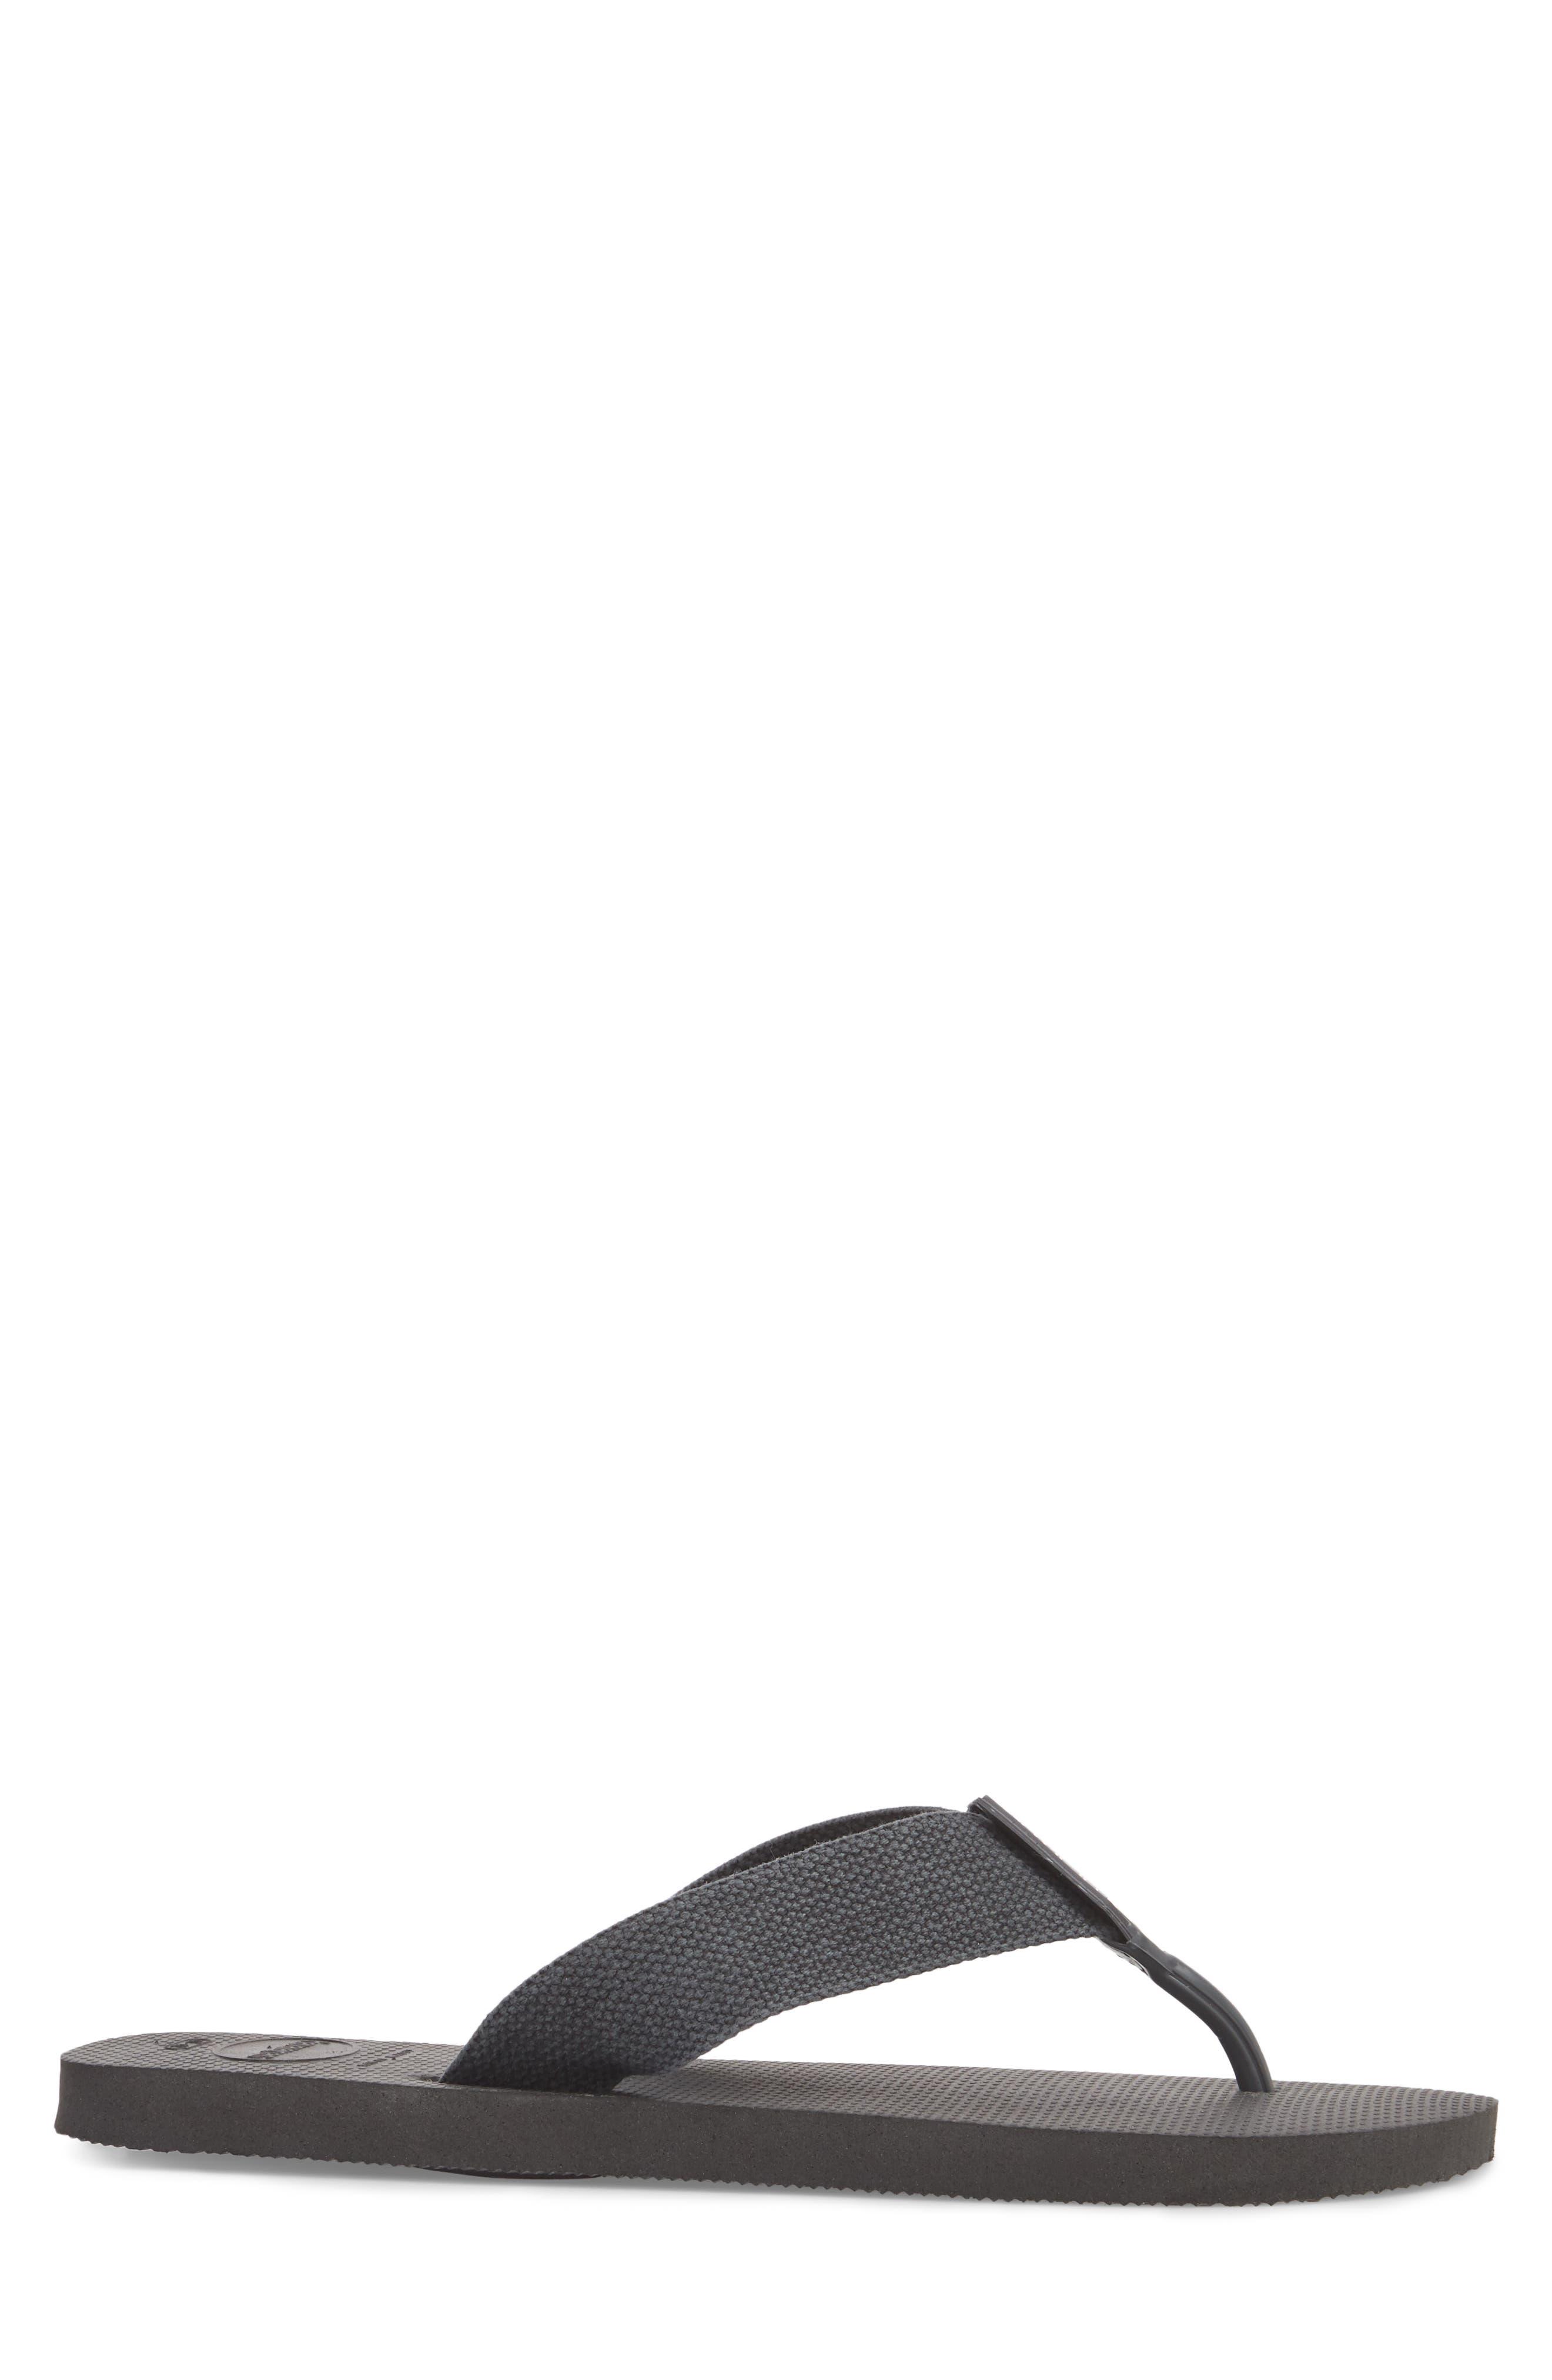 Havianas 'Urban Basic' Flip Flop,                             Alternate thumbnail 3, color,                             Black/ Grey